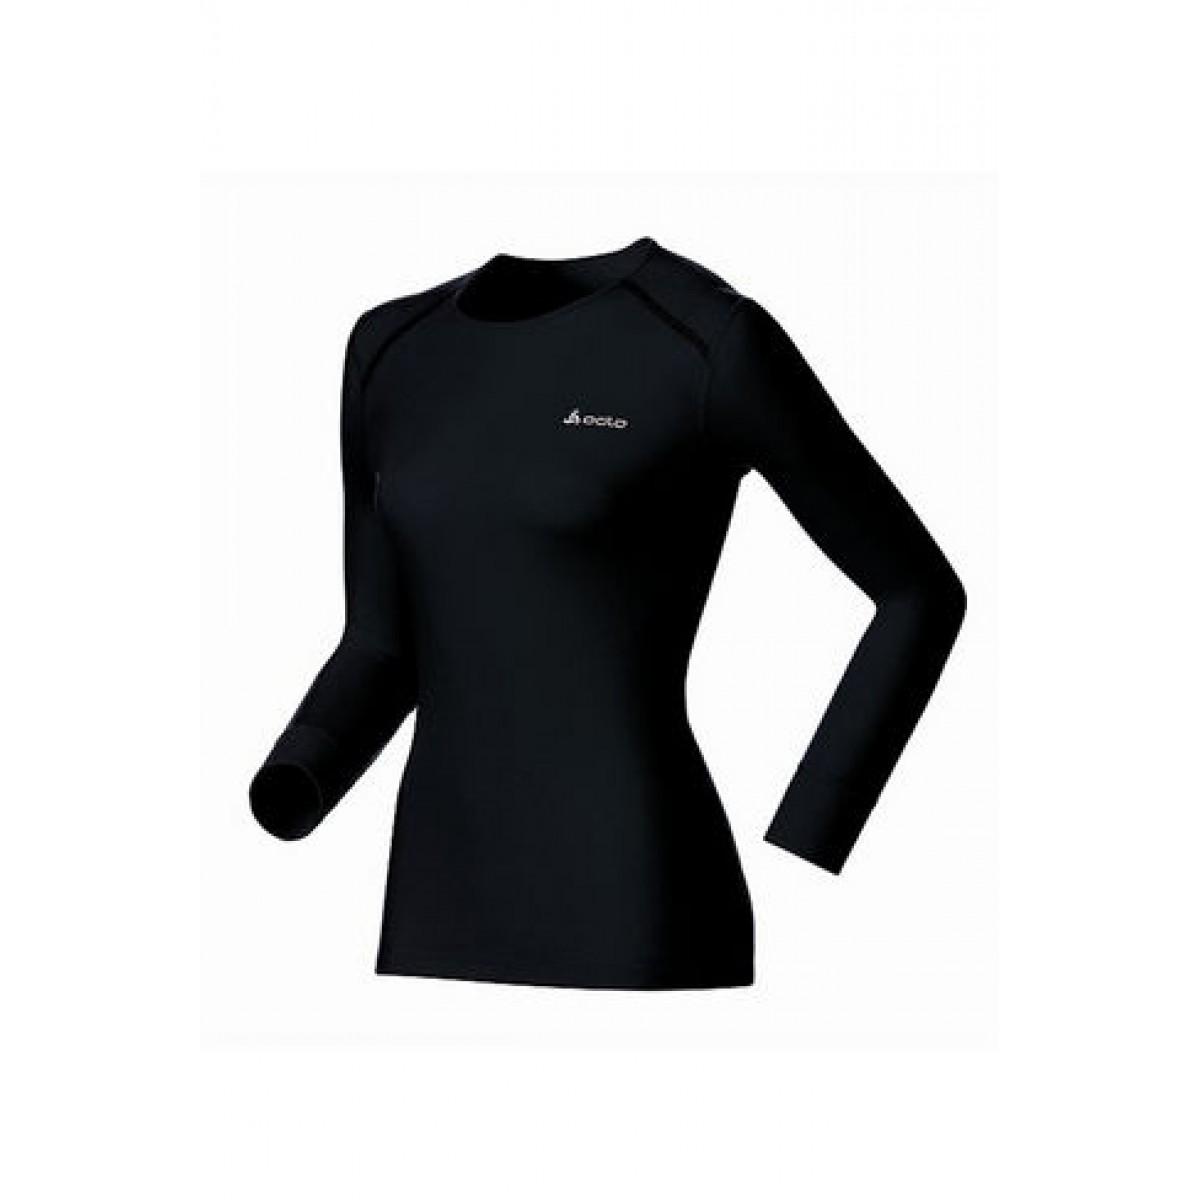 odlo women original warm long sleeve crew odlo base layers b97b72311